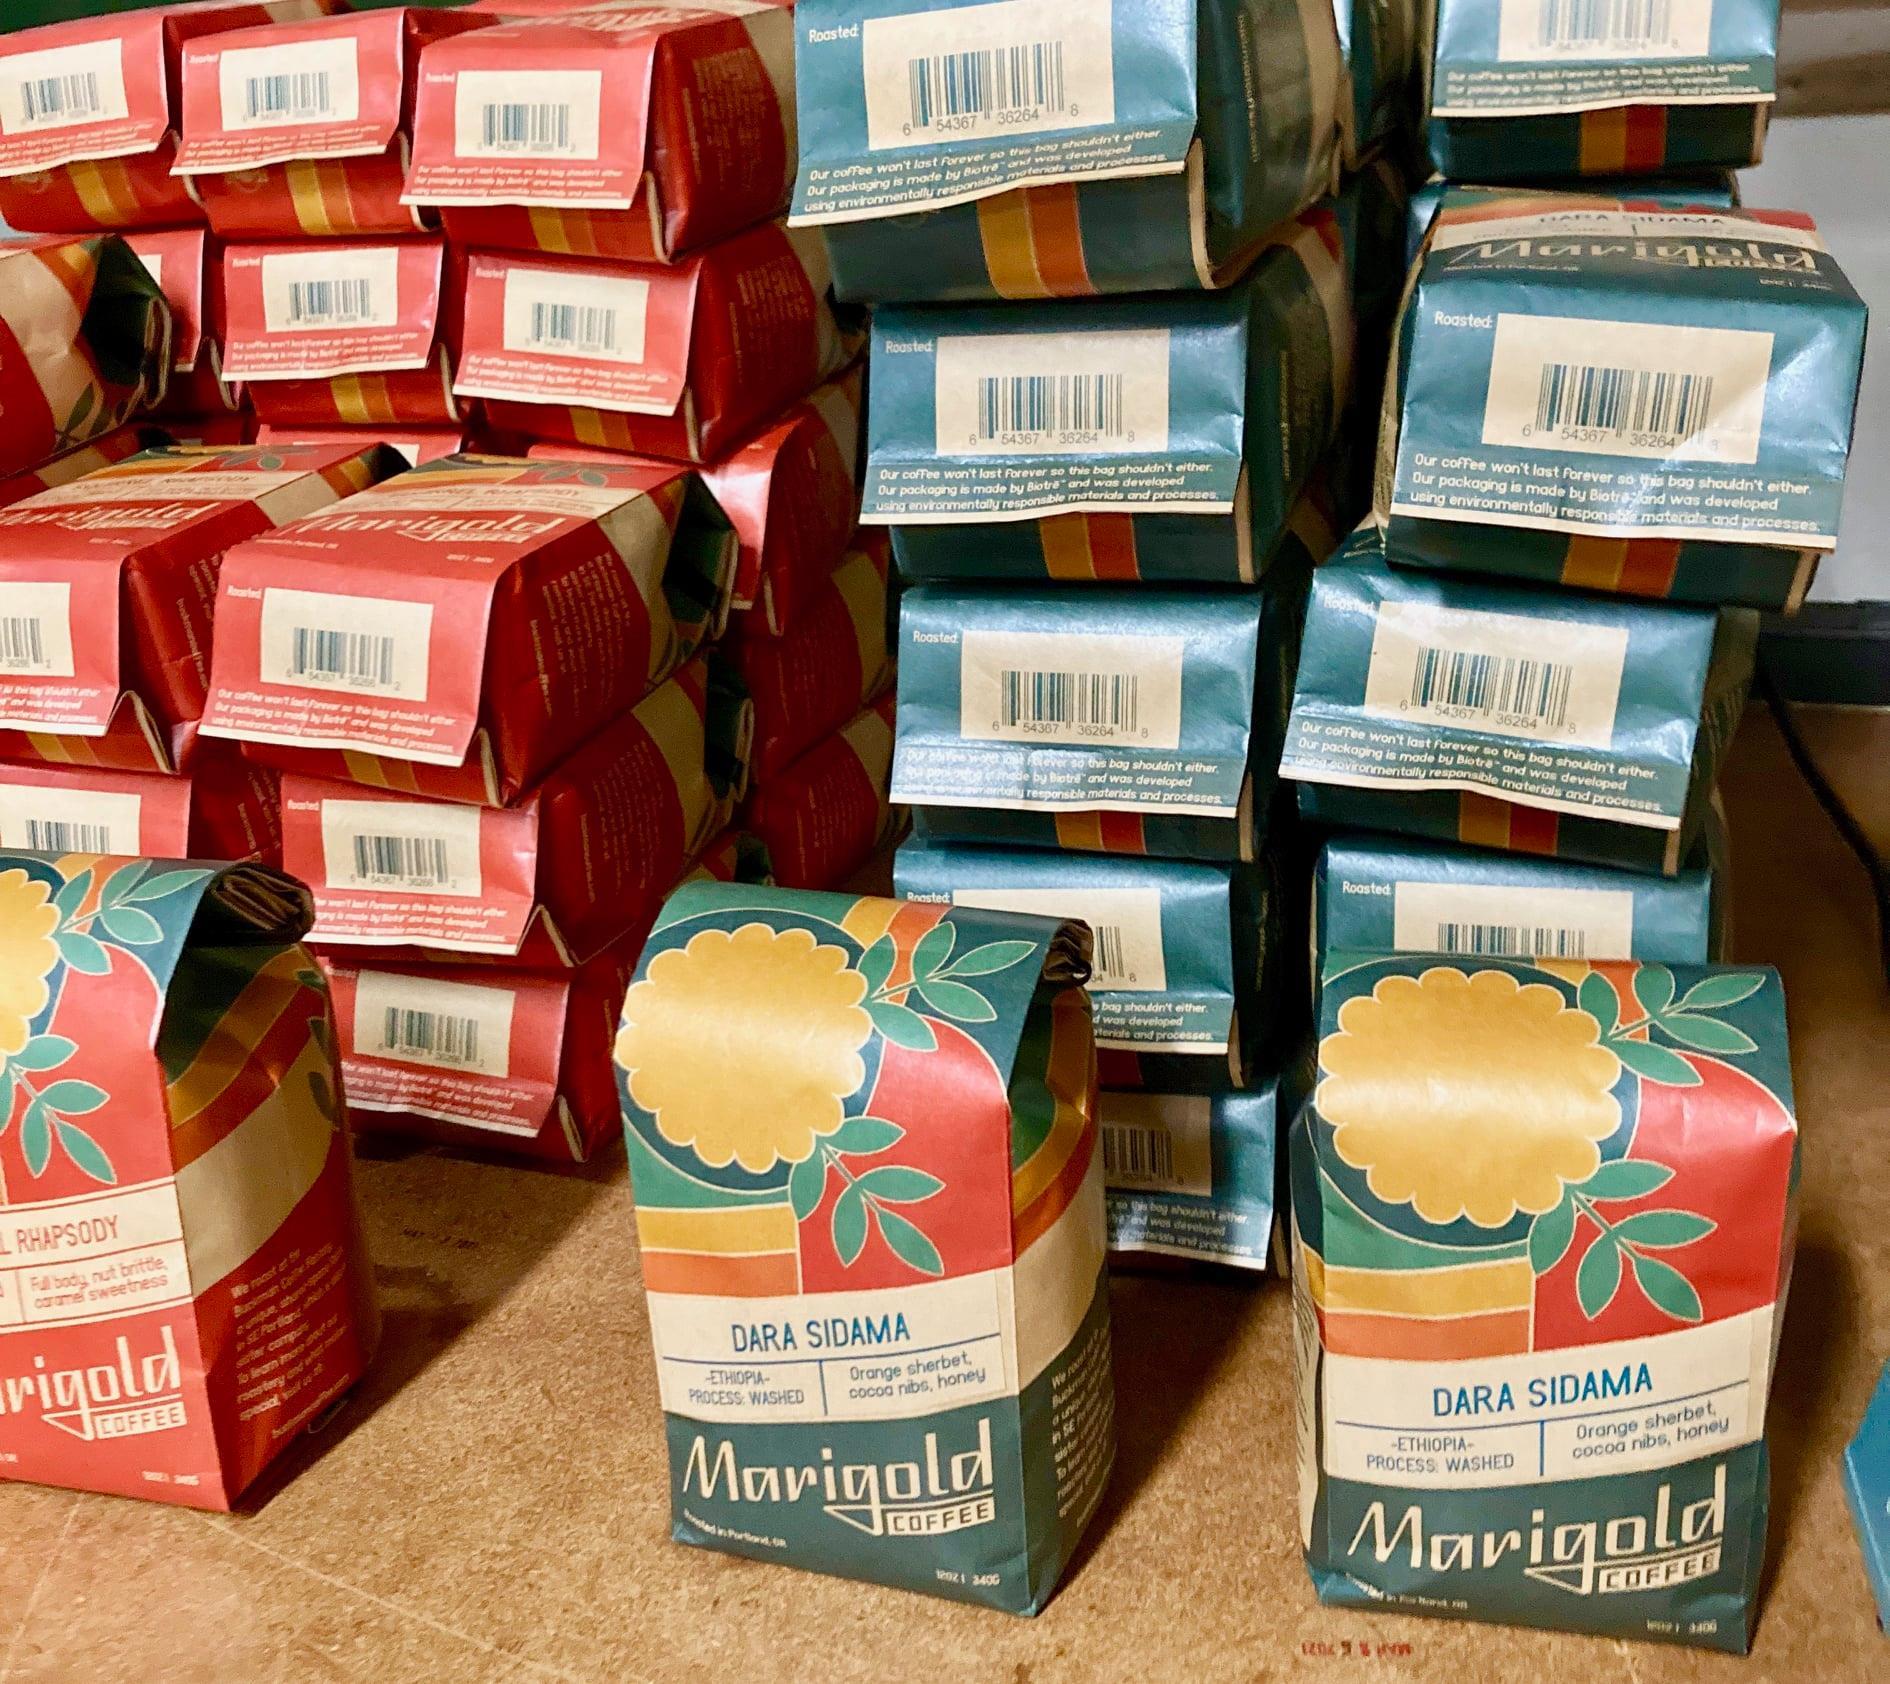 Marigold Coffee